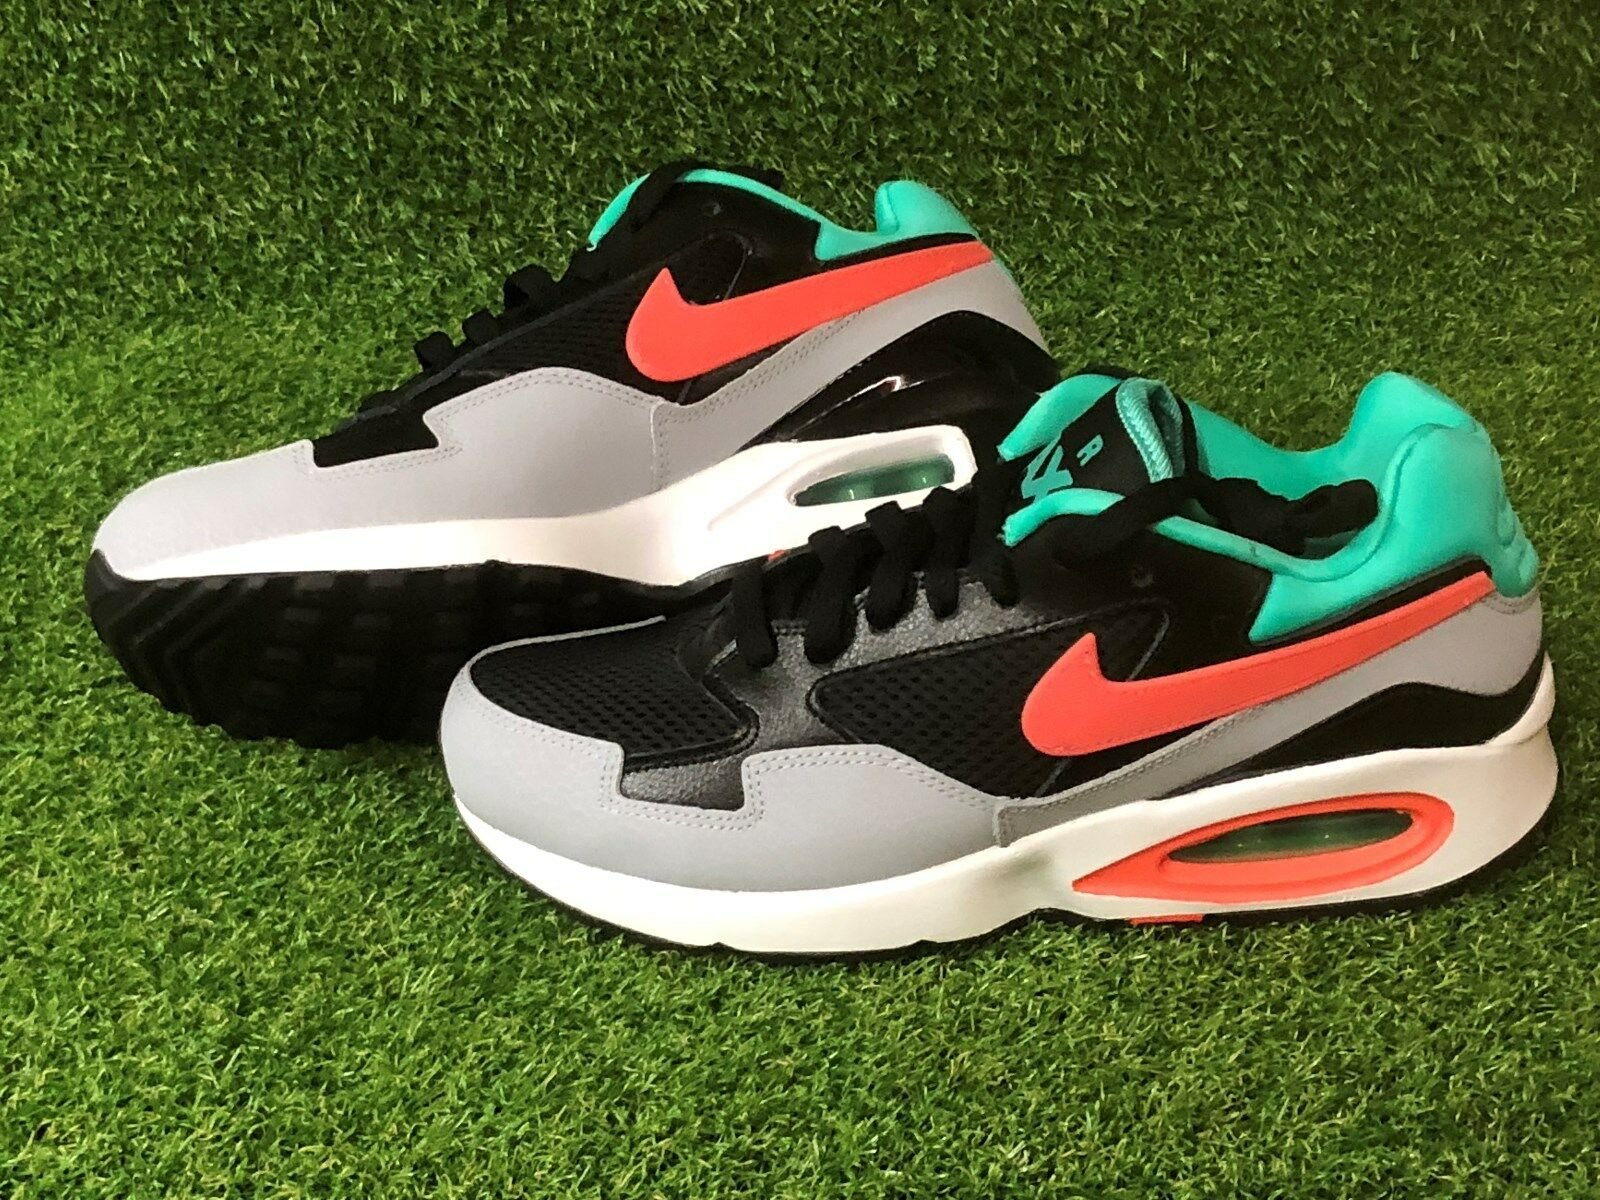 0a7c34974e6 Nike Nike Nike Wmns Air Max St Sneaker Femmes  705003 002  NEUF taille choix